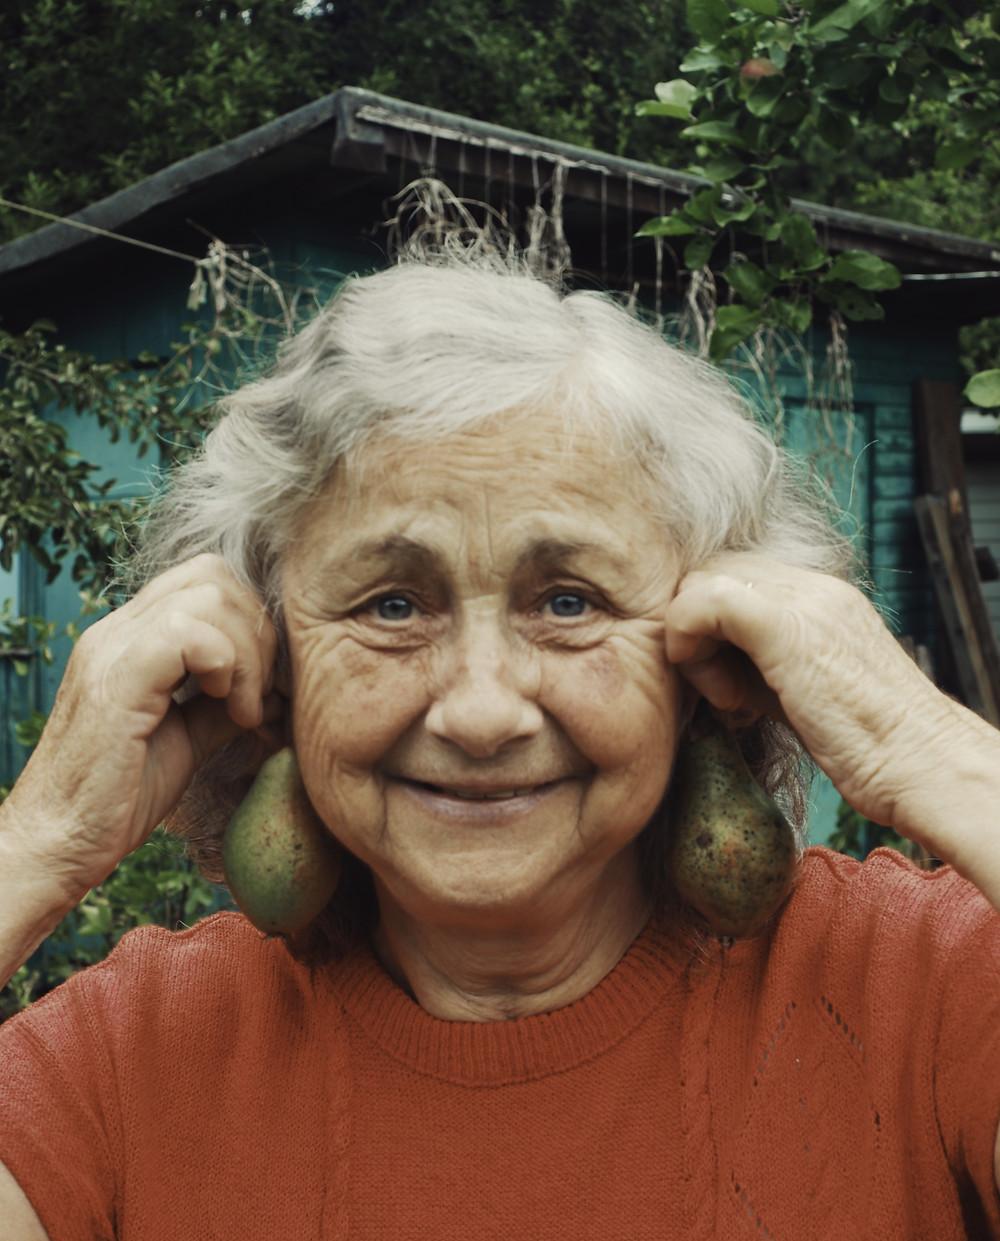 Grandma holding avocadoes as earrings